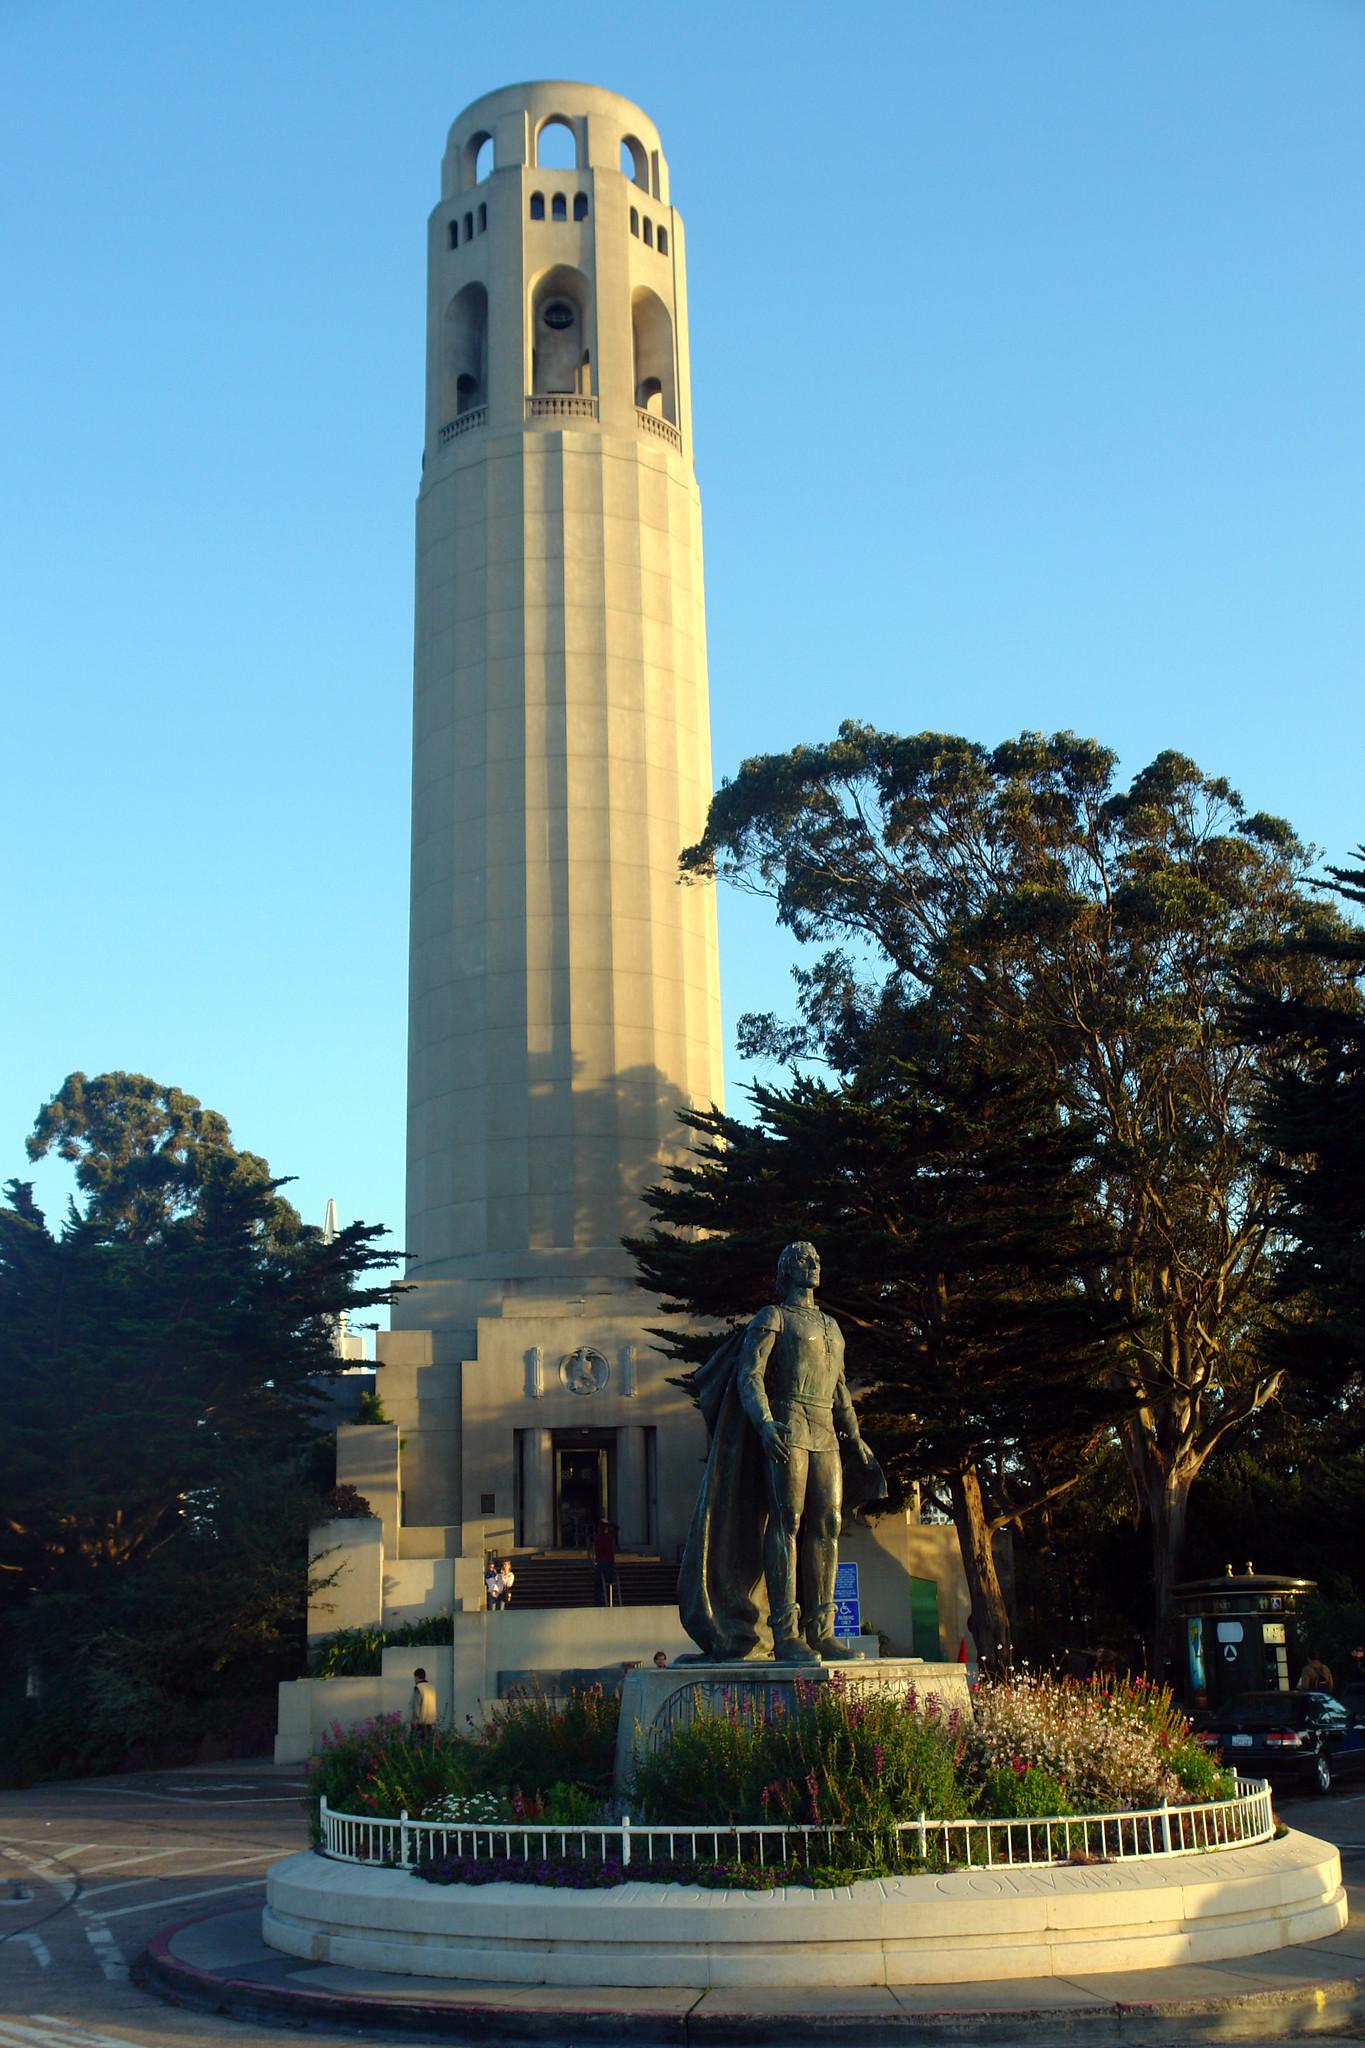 Que ver en San Francisco, California que ver en san francisco - 39990930575 94e6609ba4 k - 10 lugares mágicos que ver en San Francisco, California